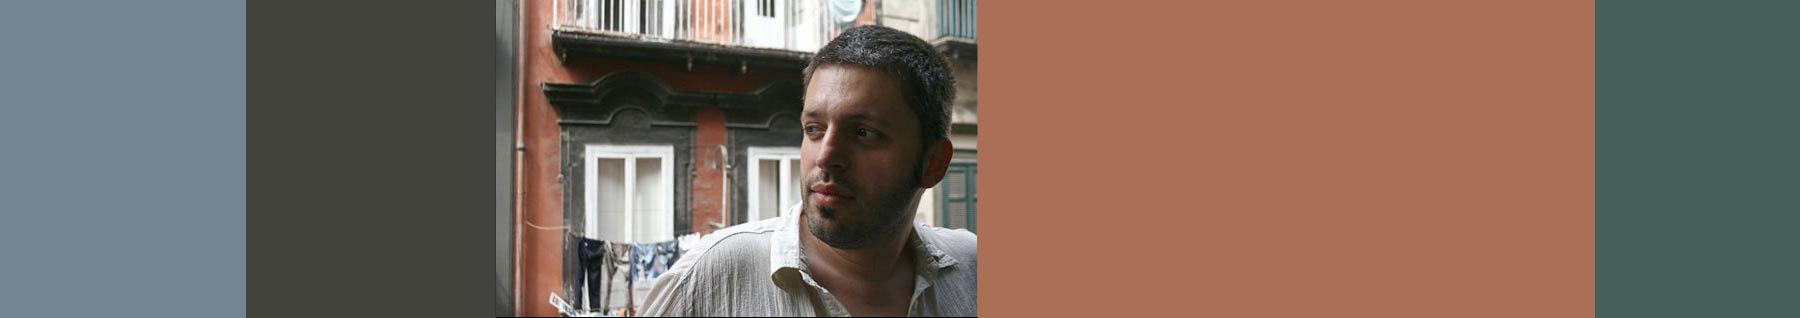 Pietro Galeoto